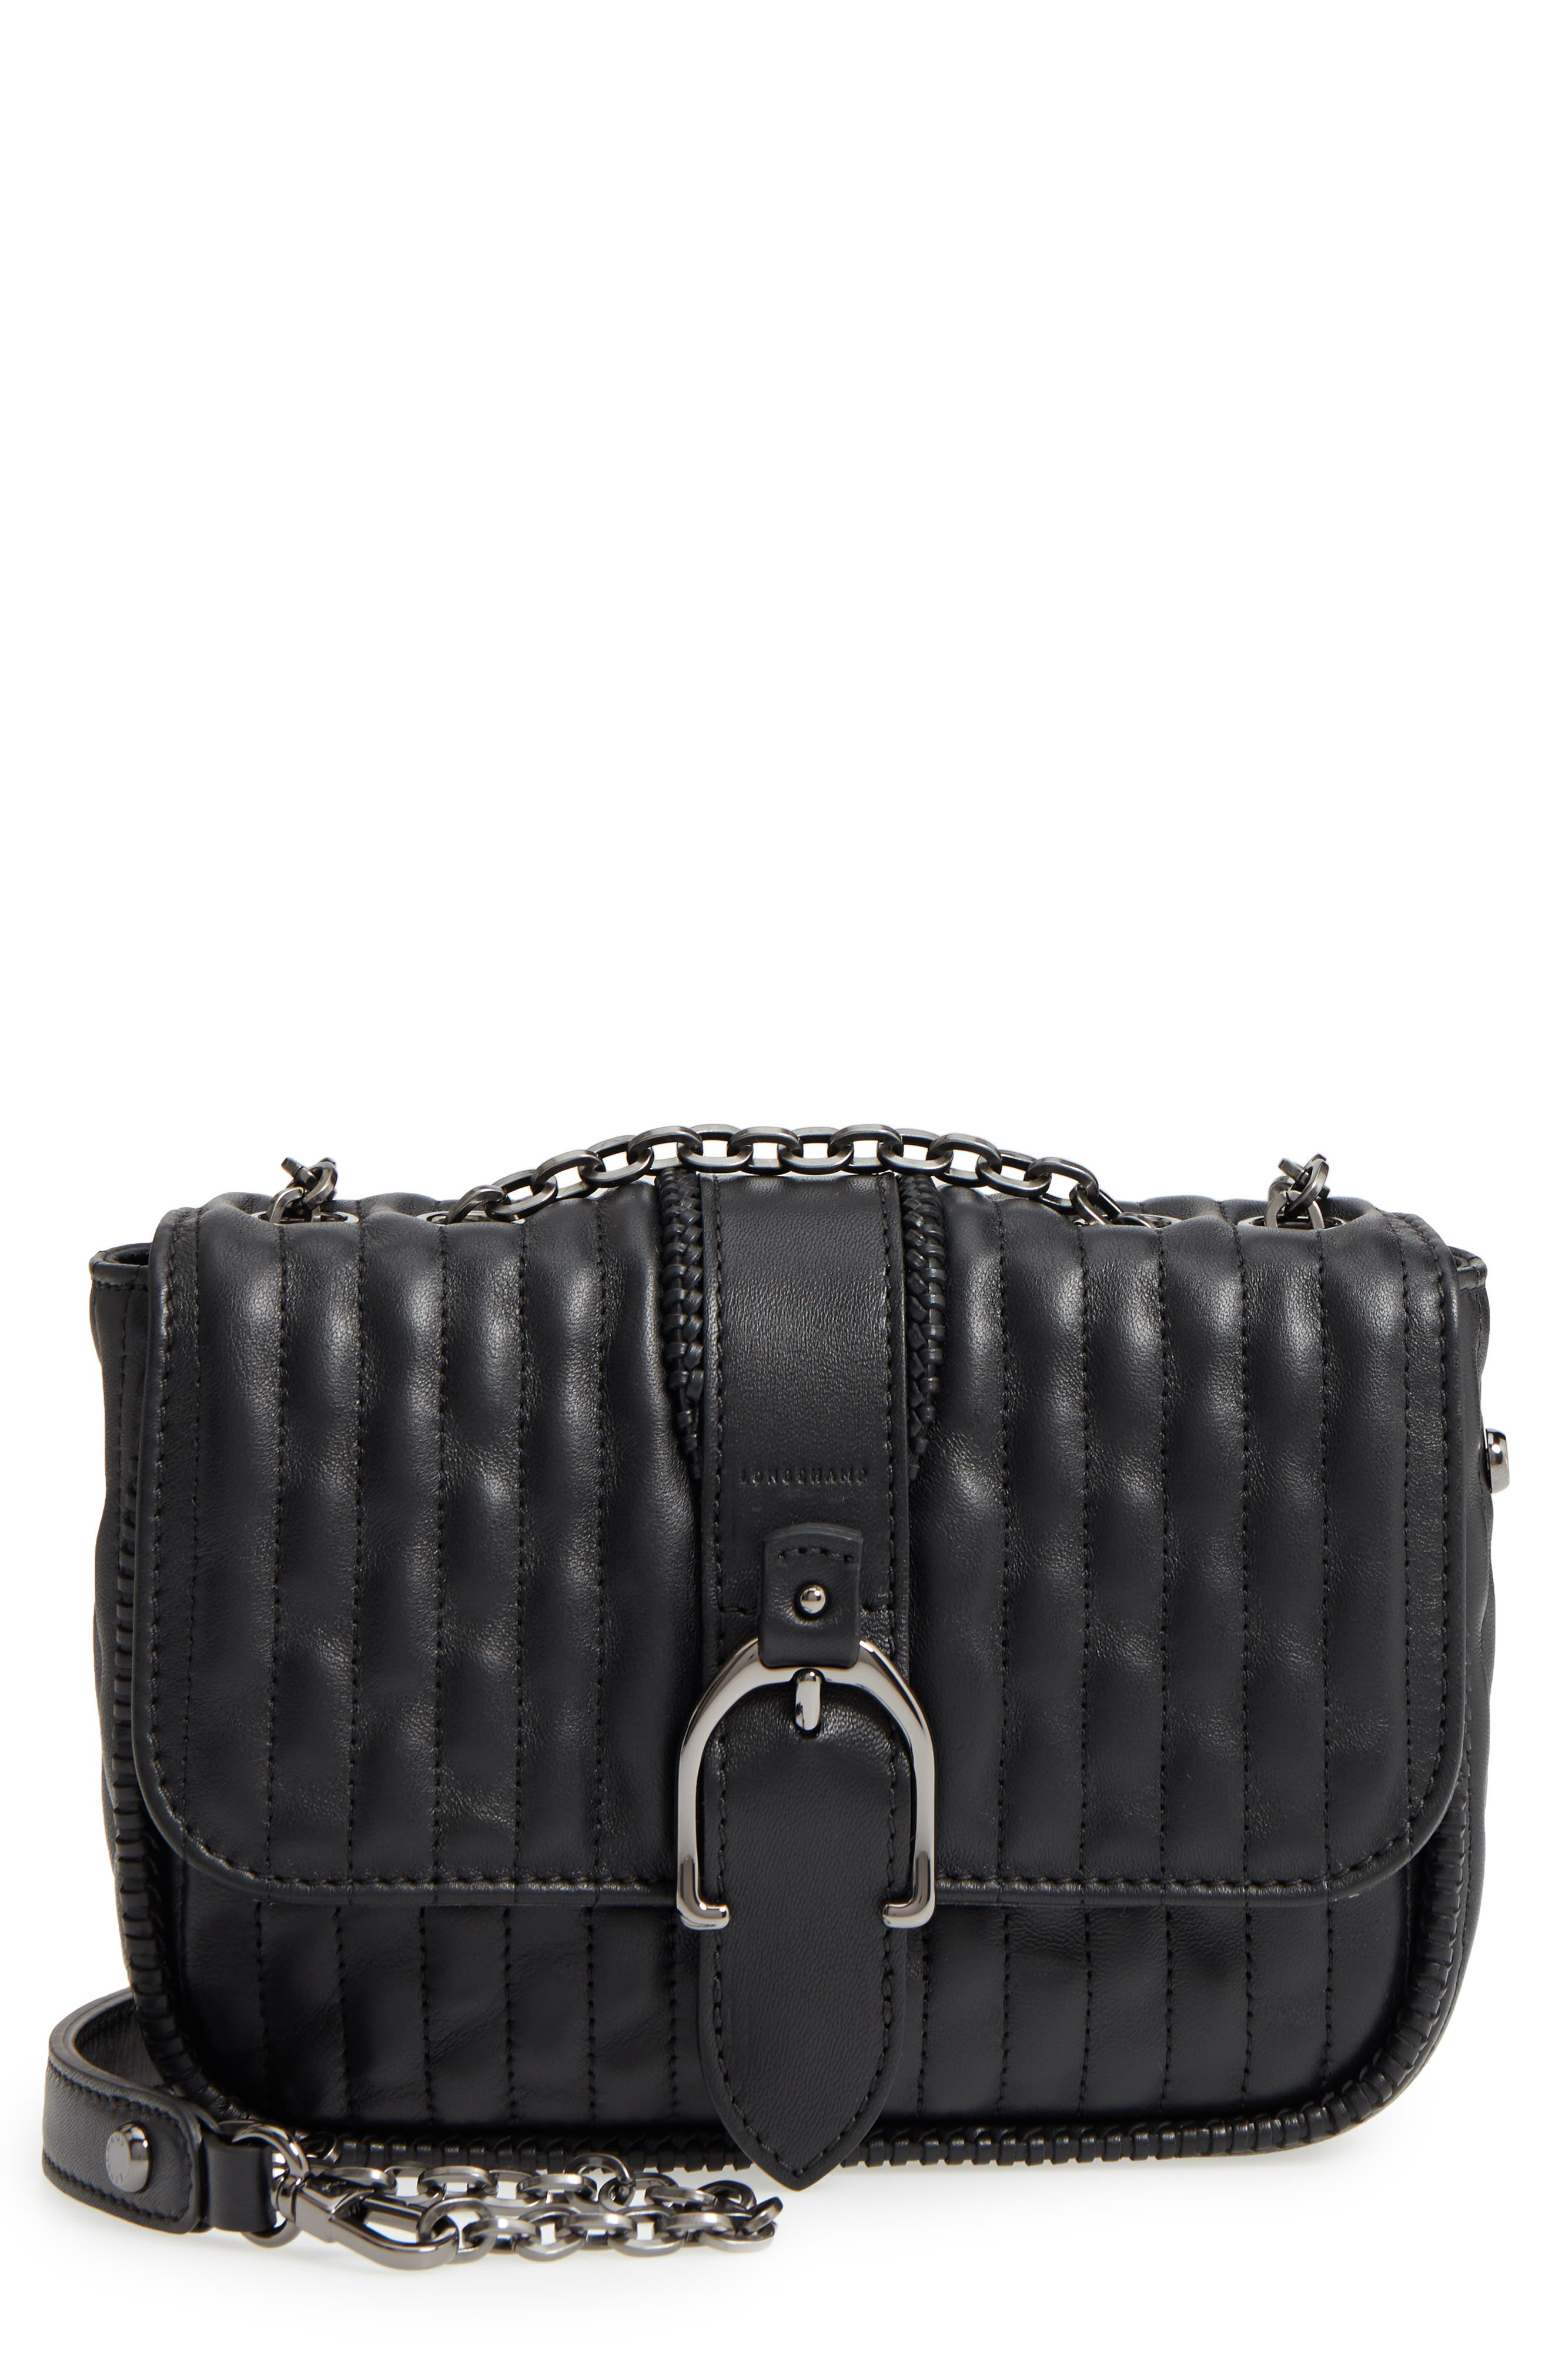 LONGCHAMP Amazone Quilted Leather Crossbody Bag - Black